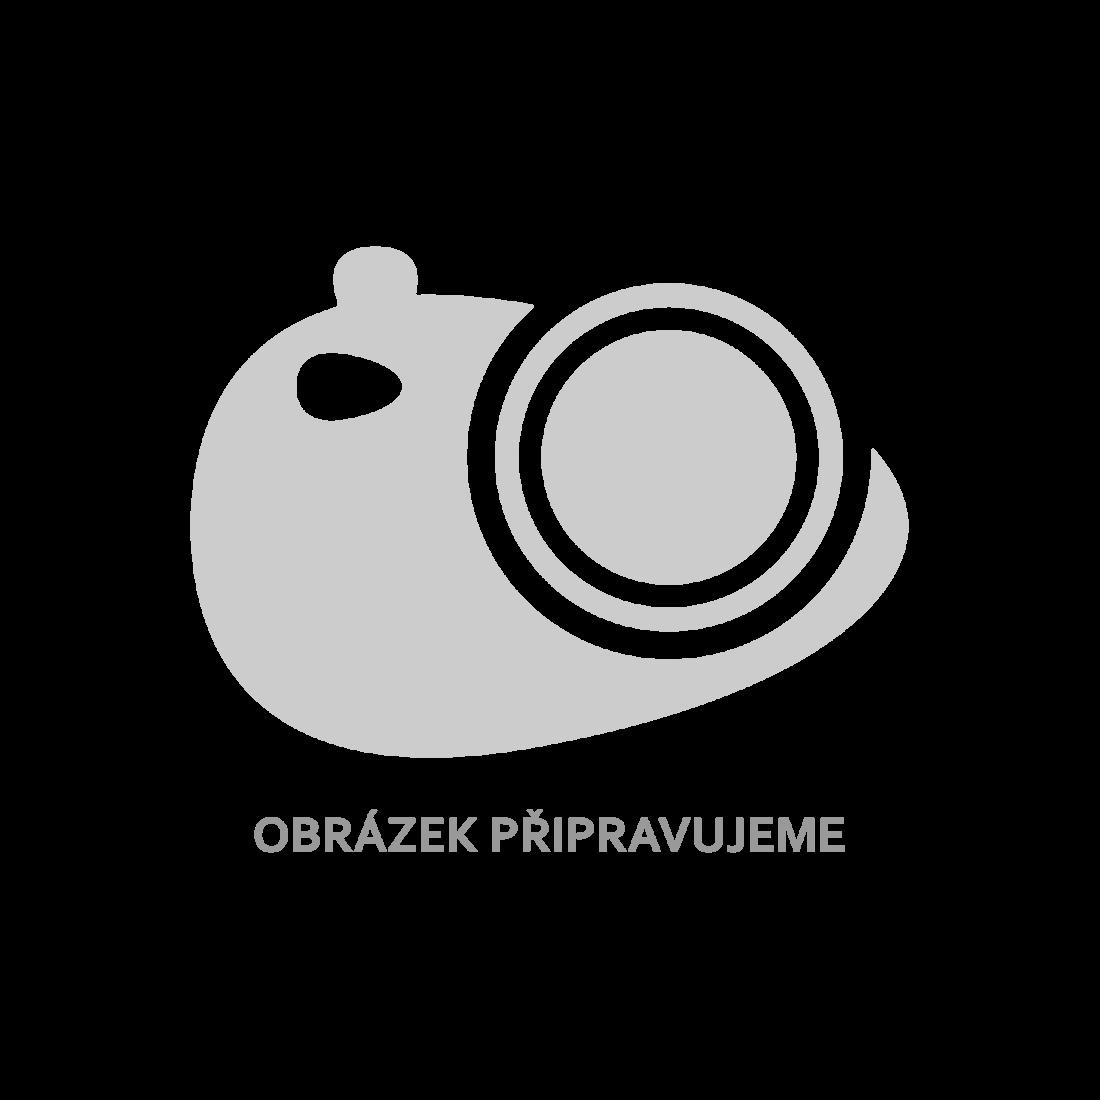 Plastové protisněhové a ochranné pletivo - 50 m - oranžové